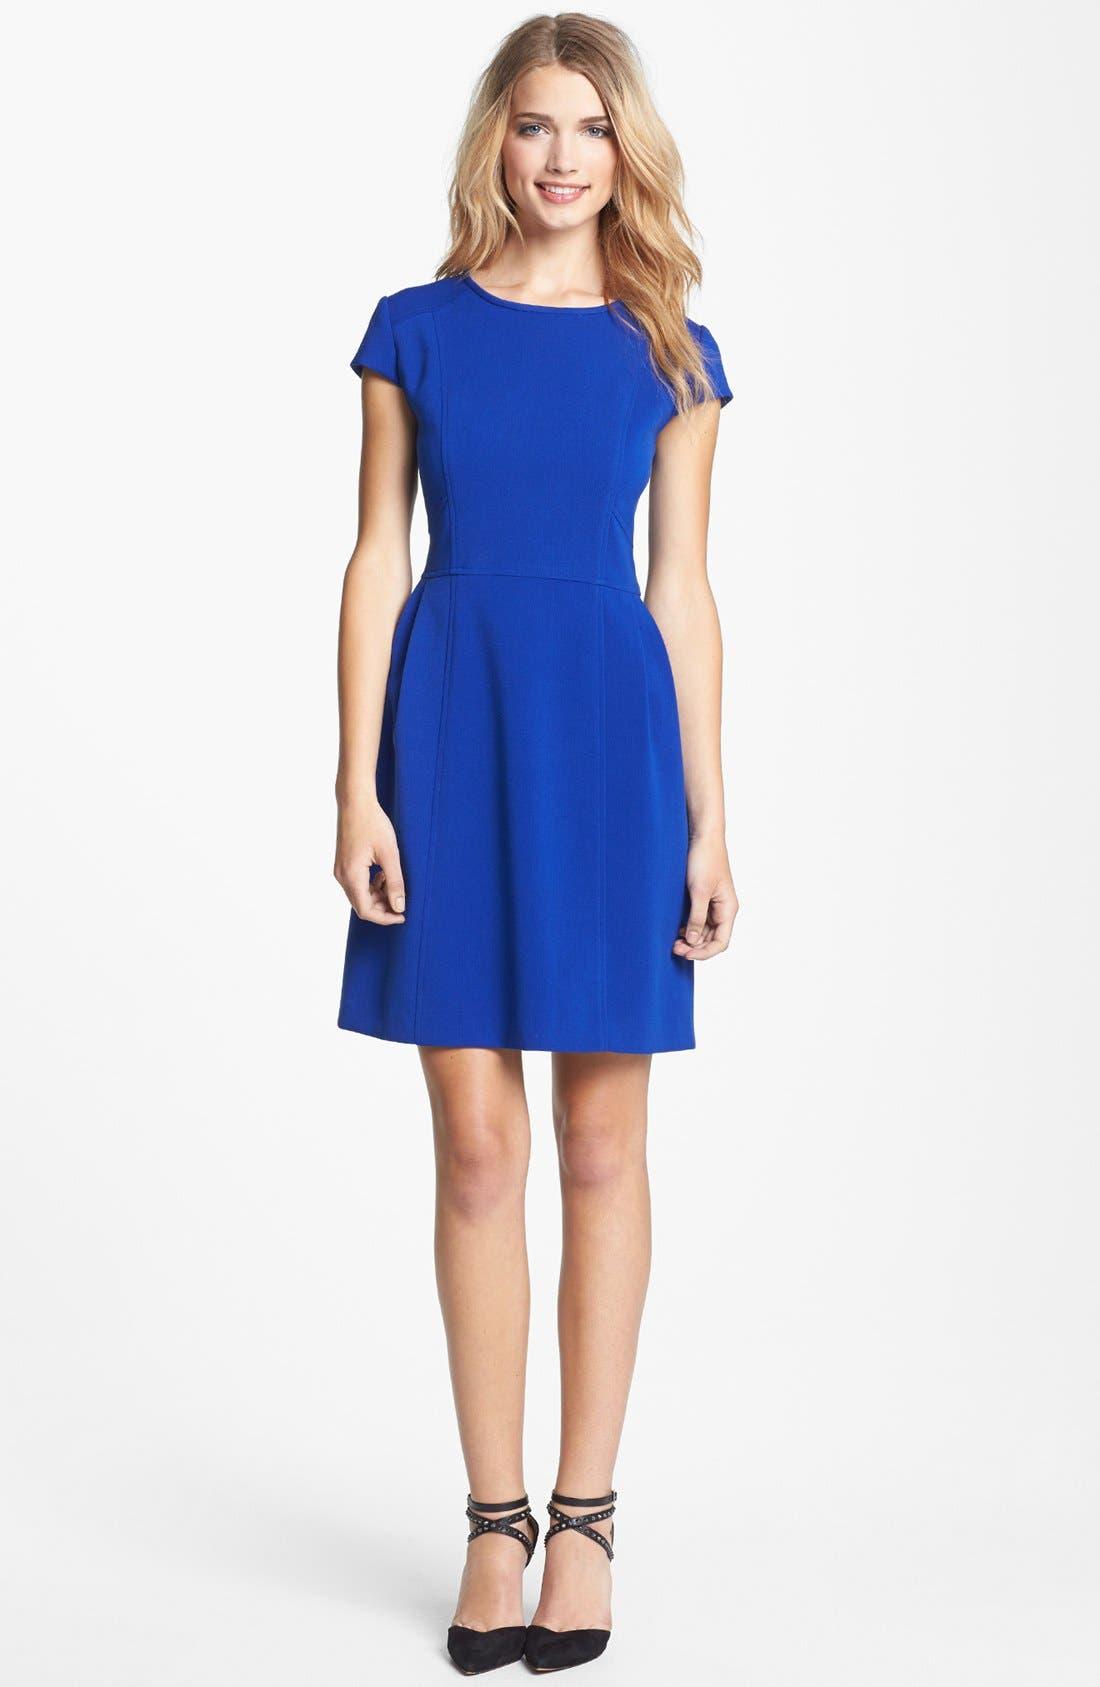 Main Image - Eliza J Seamed Double Knit Crepe Fit & Flare Dress (Regular & Petite)